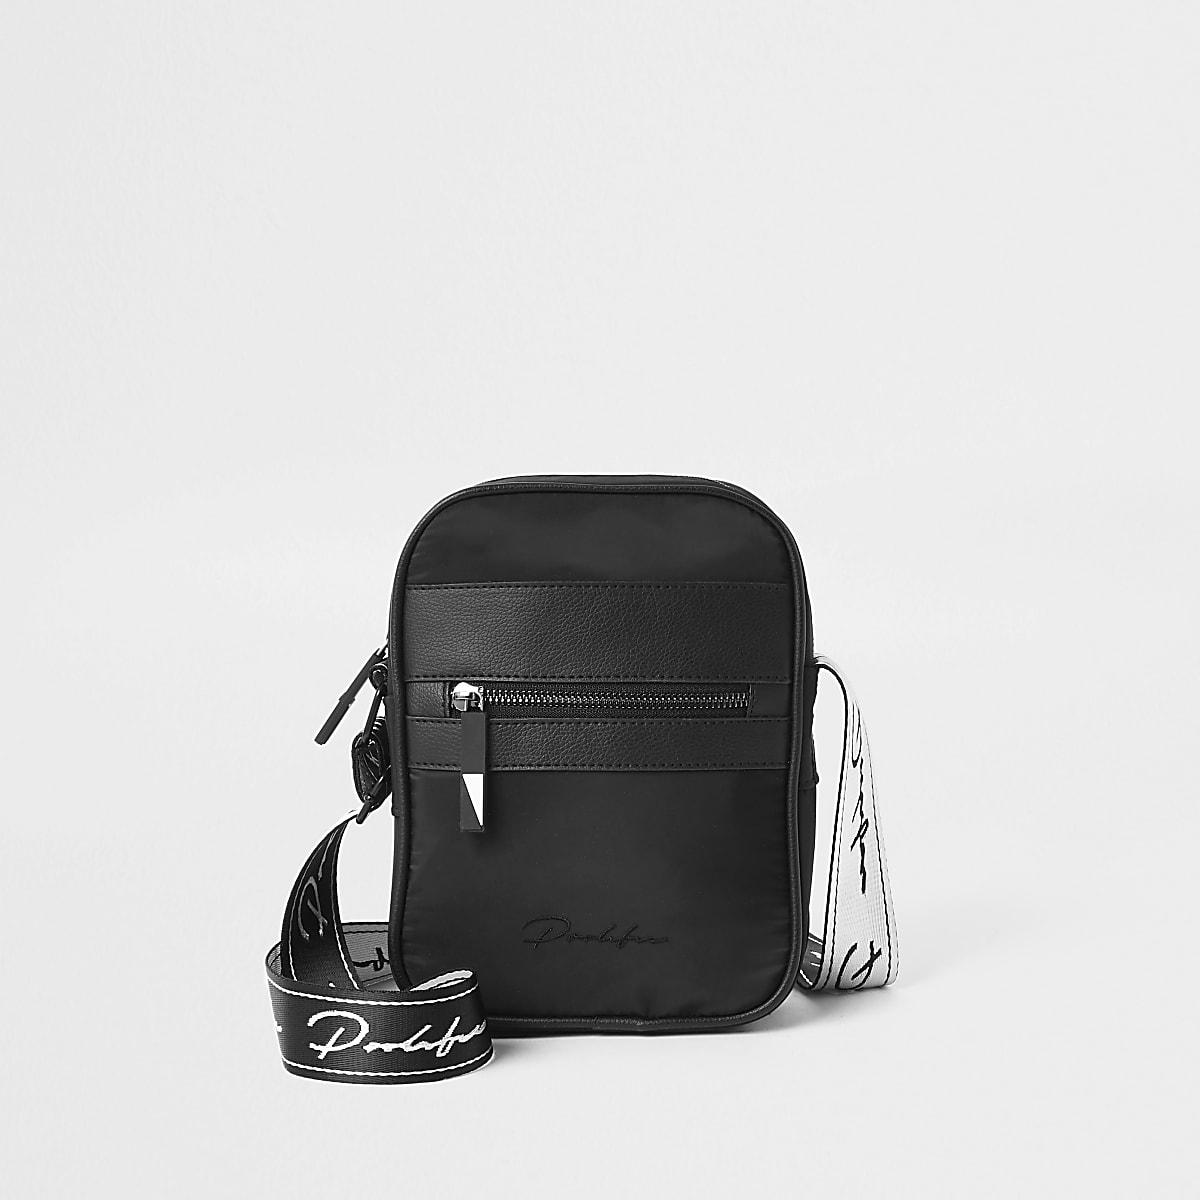 Black Prolific cross body flight bag